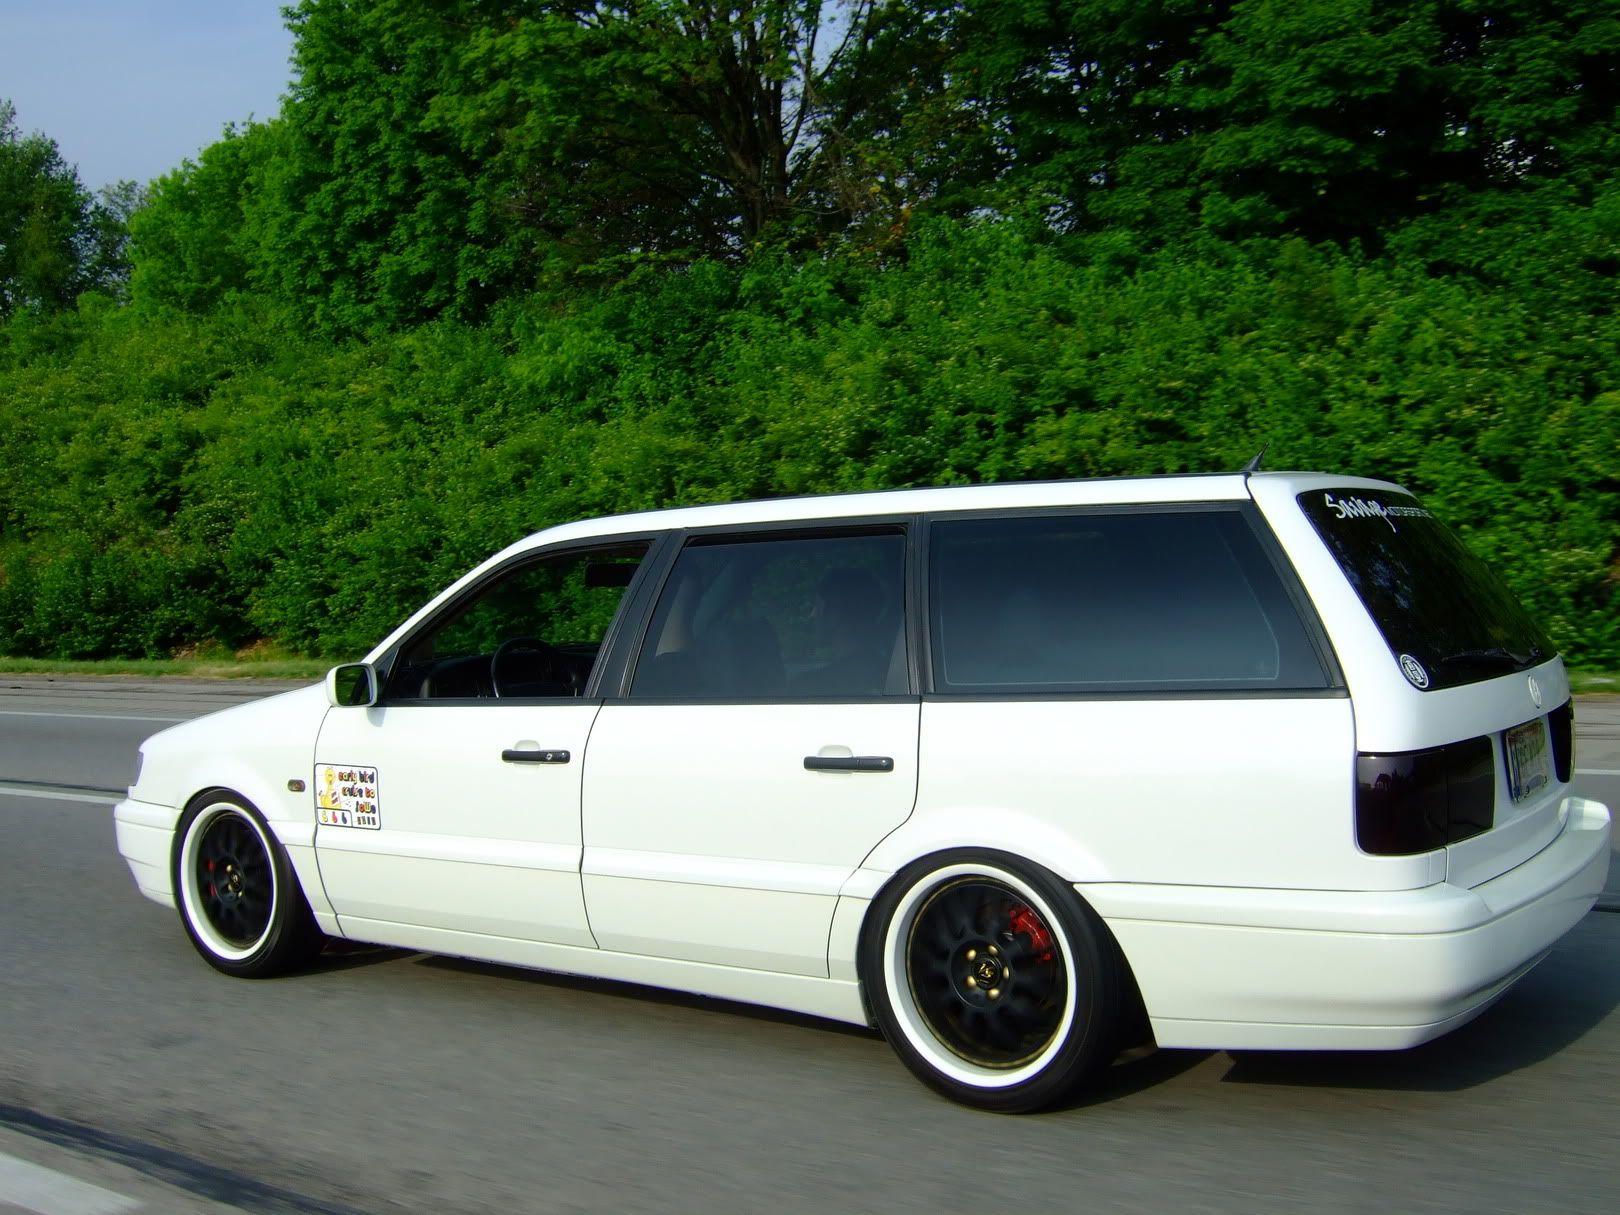 Passat wagon vwvortex com fs 1997 b4 passat wagon